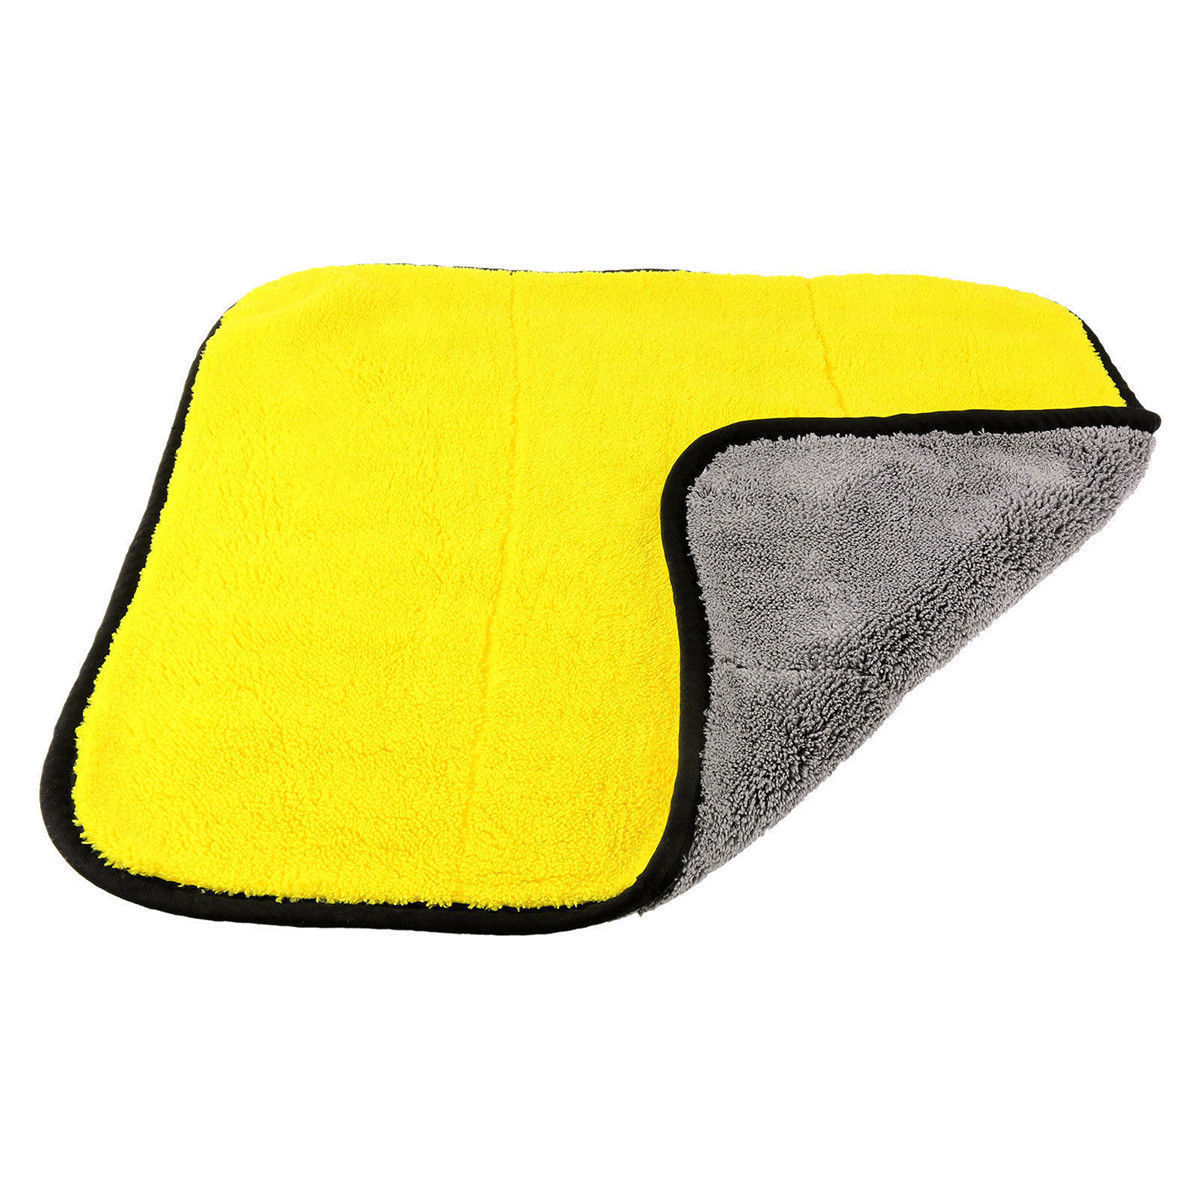 Microfiber Cleaning Cloth Bathing Towel Set RagCar Polishing NoScratch Detailing